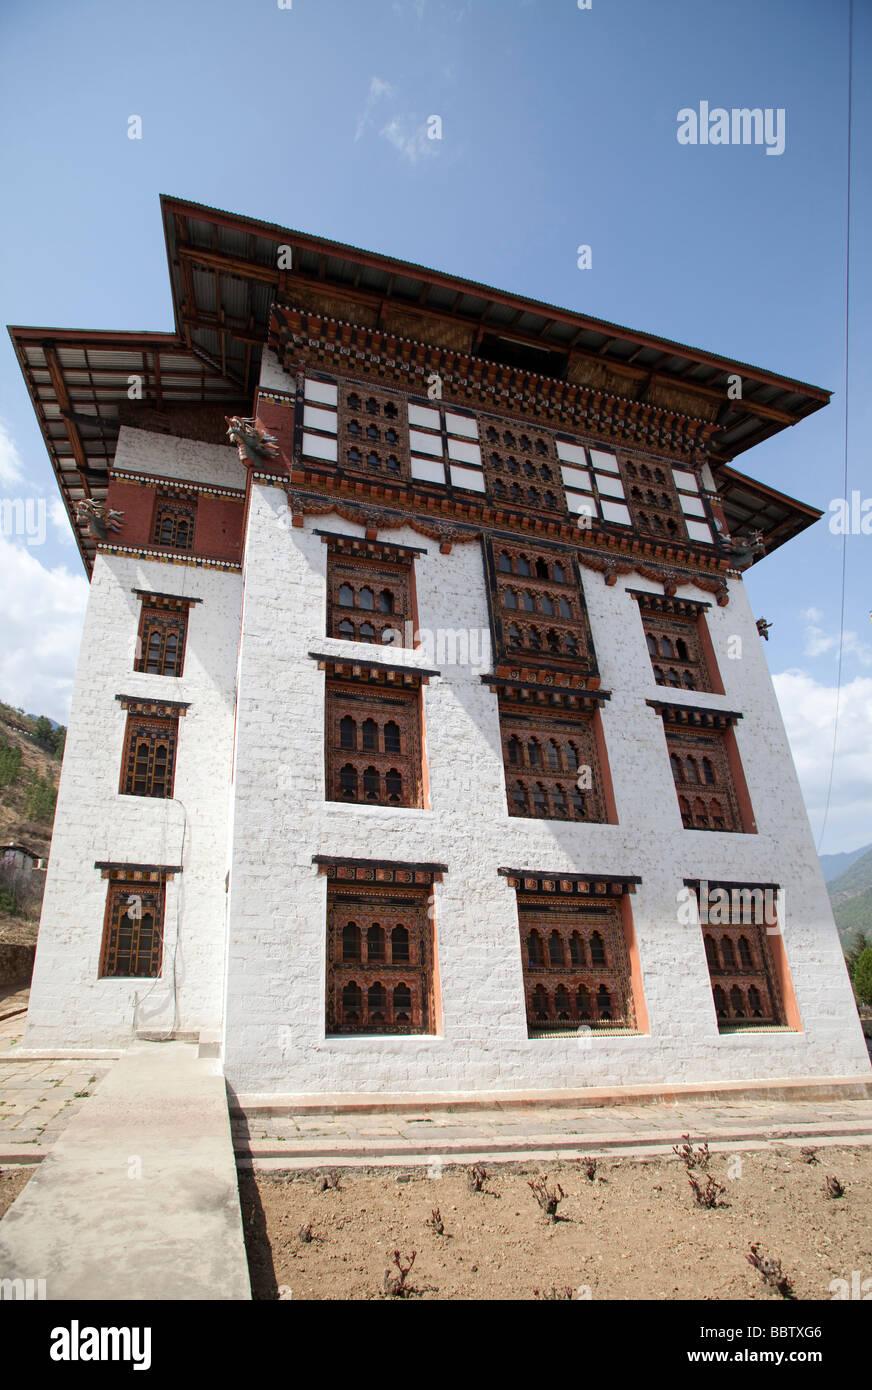 Bâtiment de la Bibliothèque nationale du Bhoutan Tashi Chho Dzong Thimphu Photo Stock